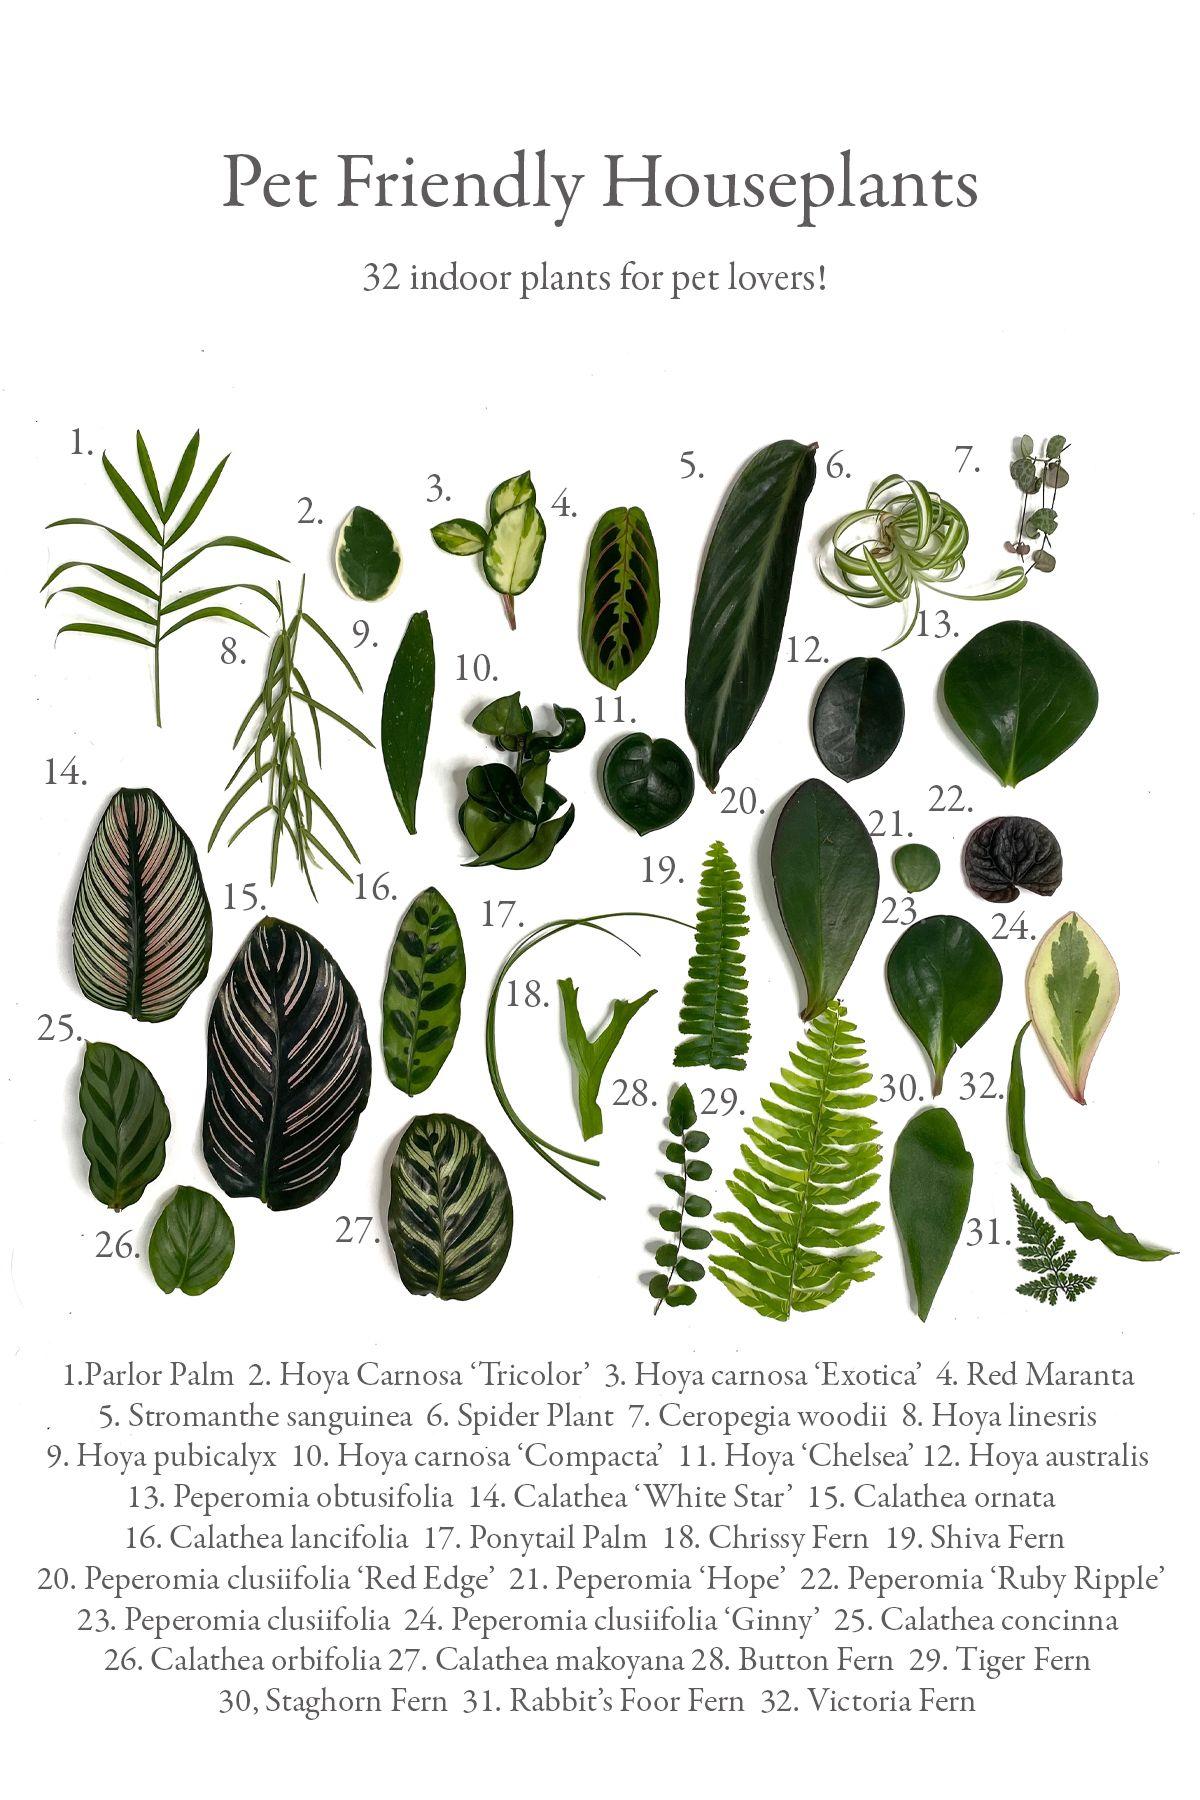 Pet Friendly Indoor Plants | Free Shipping | Planterina.com